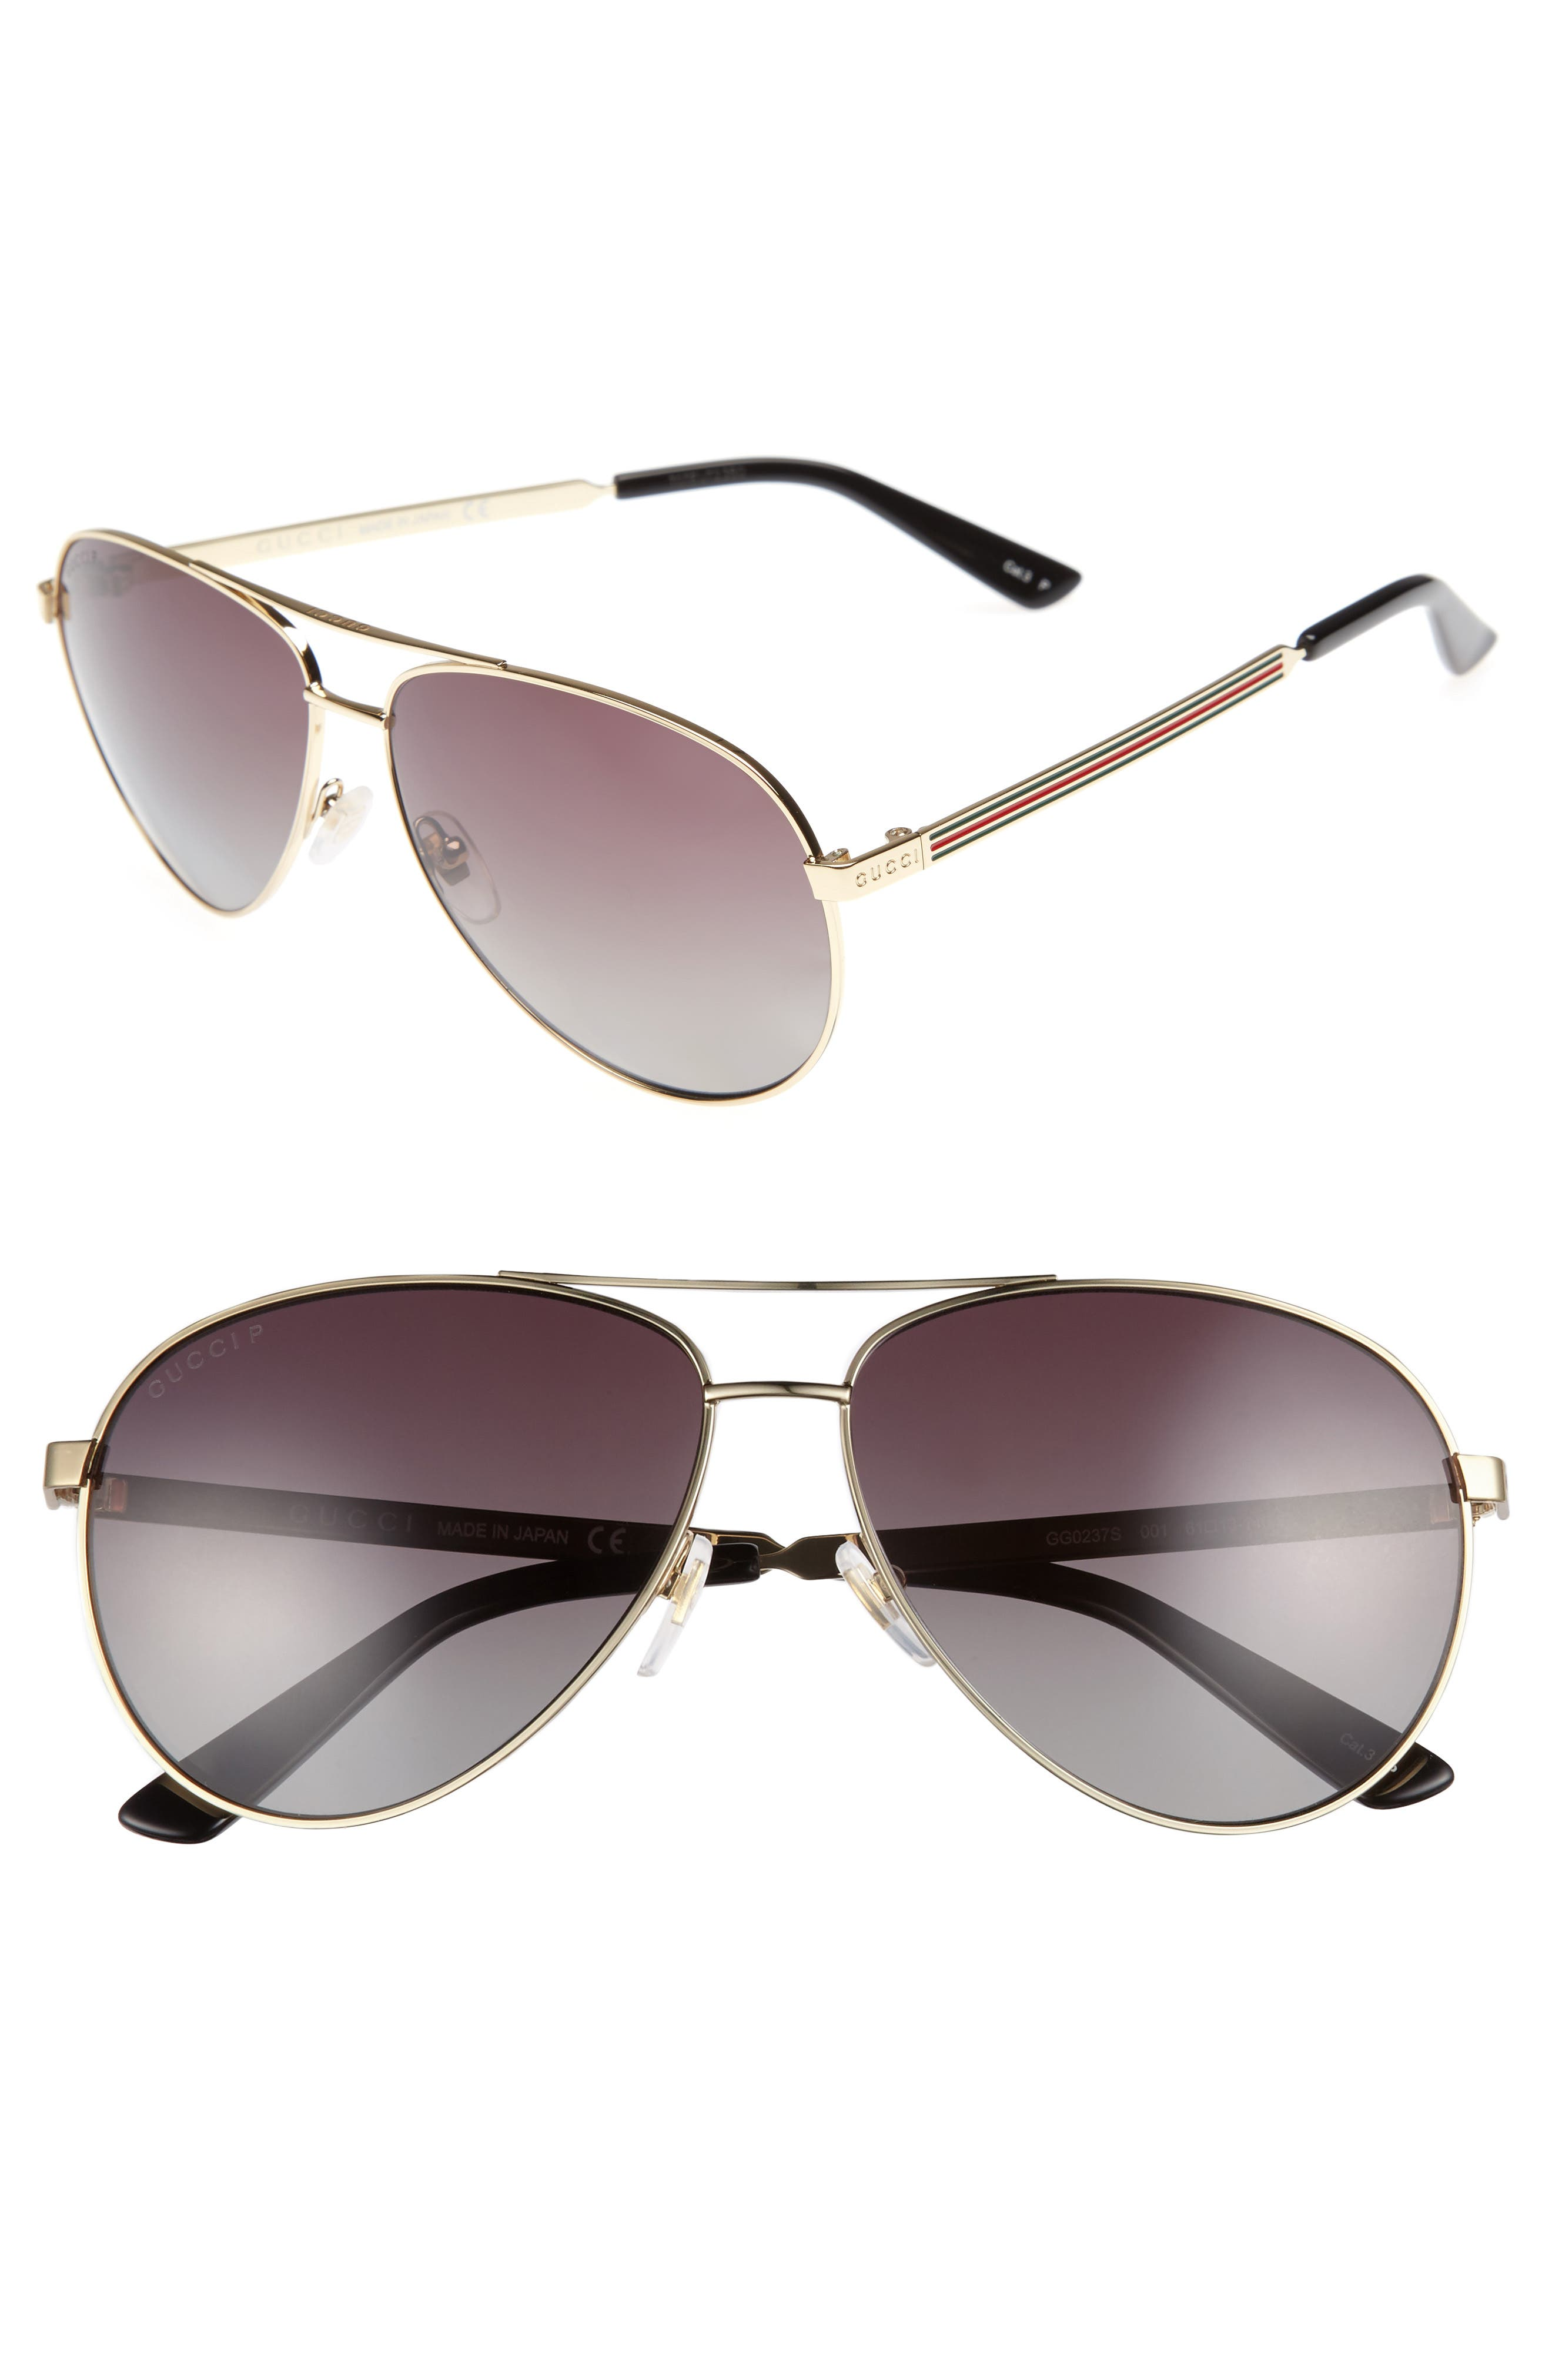 61mm Polarized Aviator Sunglasses,                             Main thumbnail 1, color,                             710